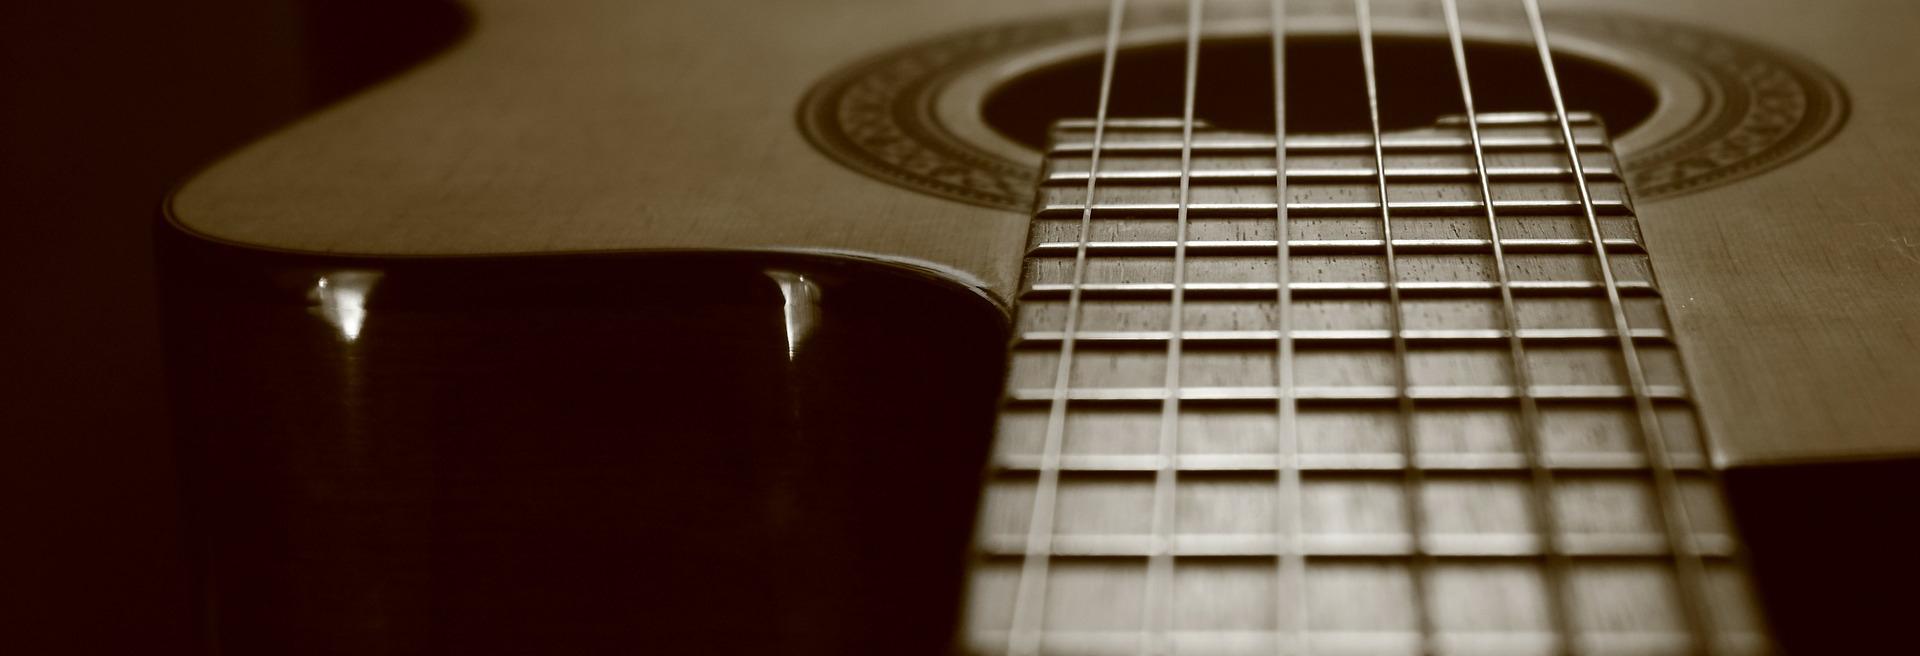 Twelve Strings, lo mejor del flamenco pop